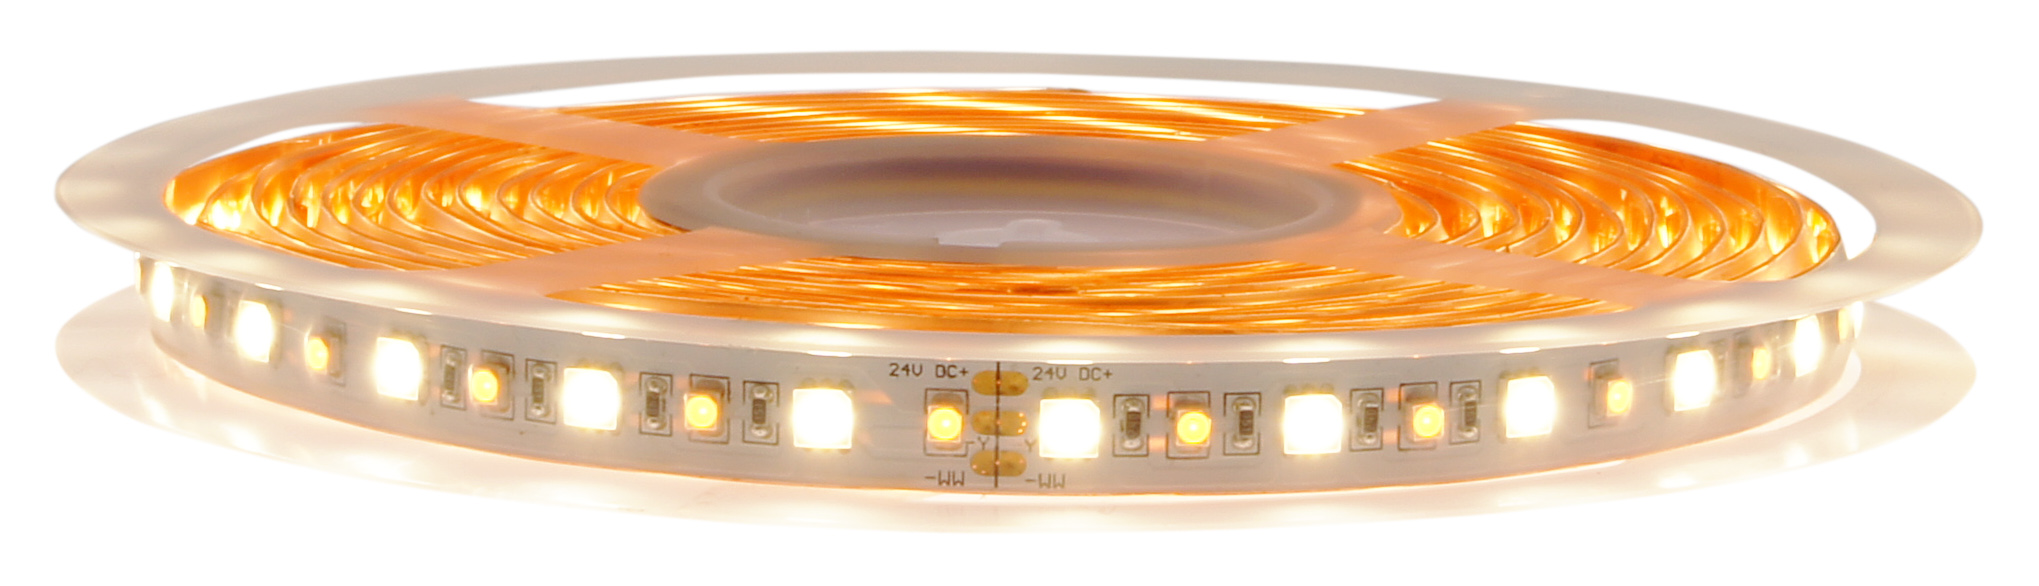 1 Stk FS 77, DH, 100% MIX, 18W/m, 1170lm/m, 24VDC, IP44, l=5m LIFS006209